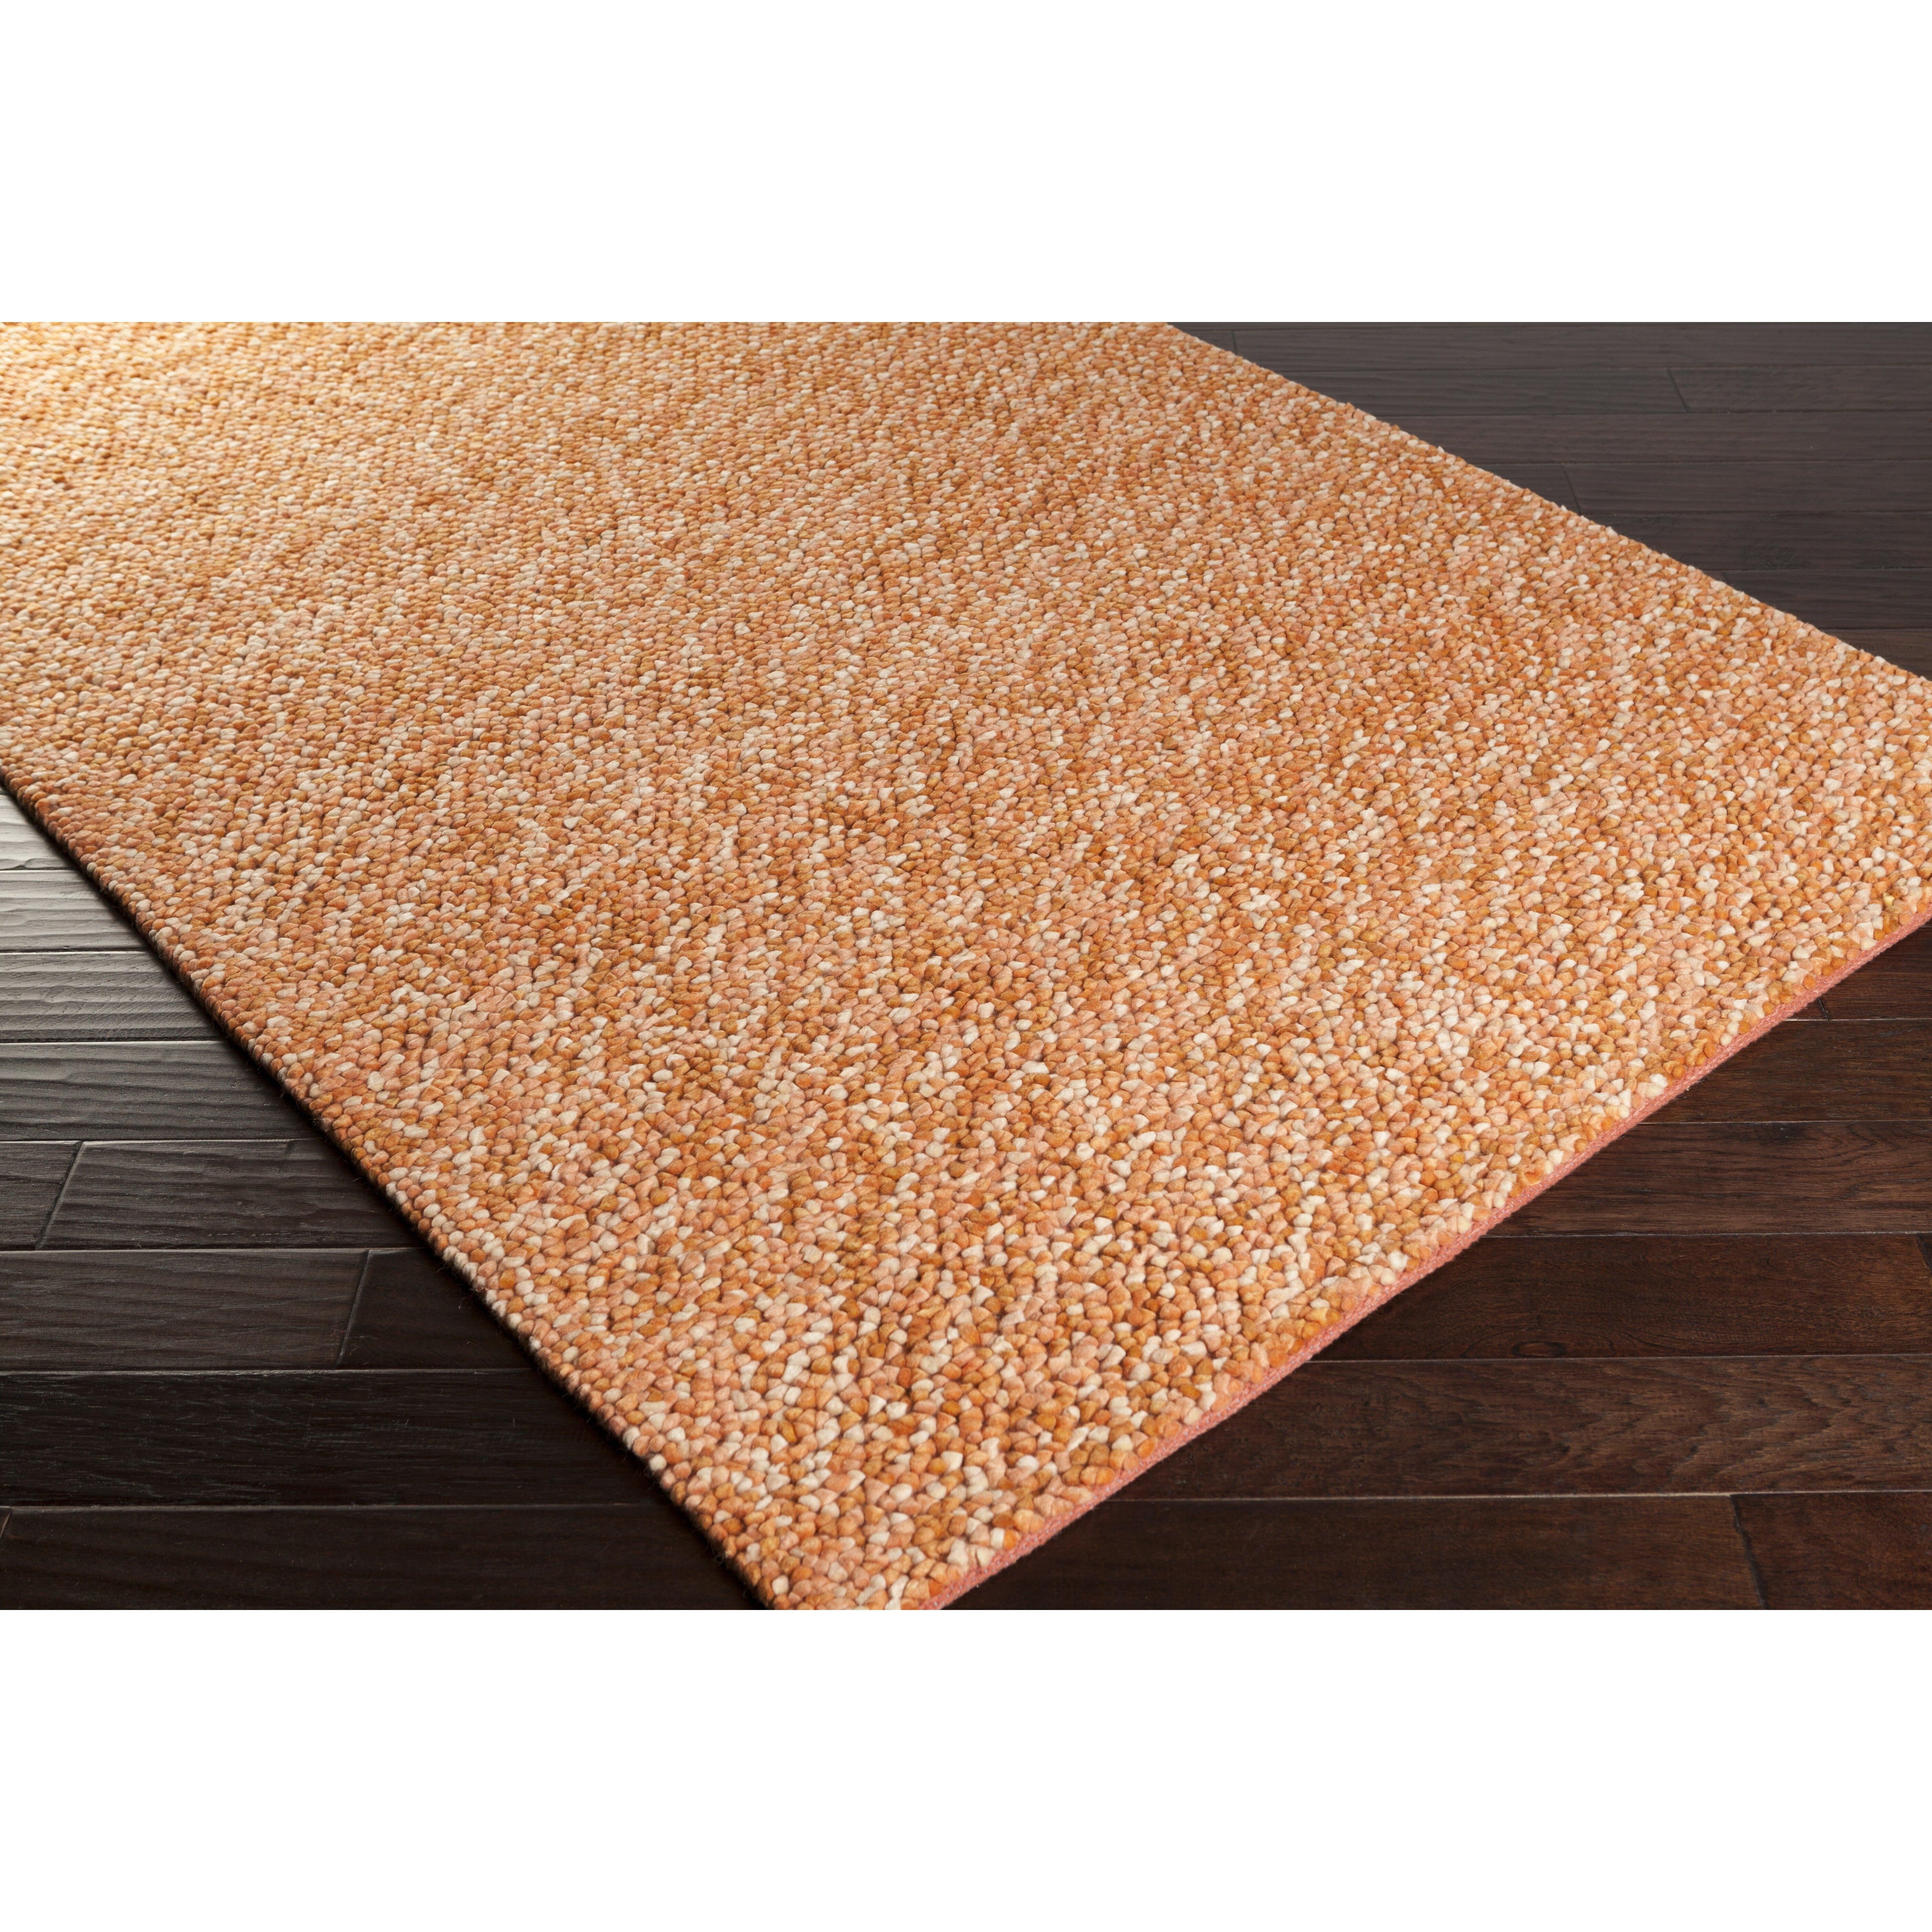 Amazoncom 7x7 round living room rug Home amp Kitchen